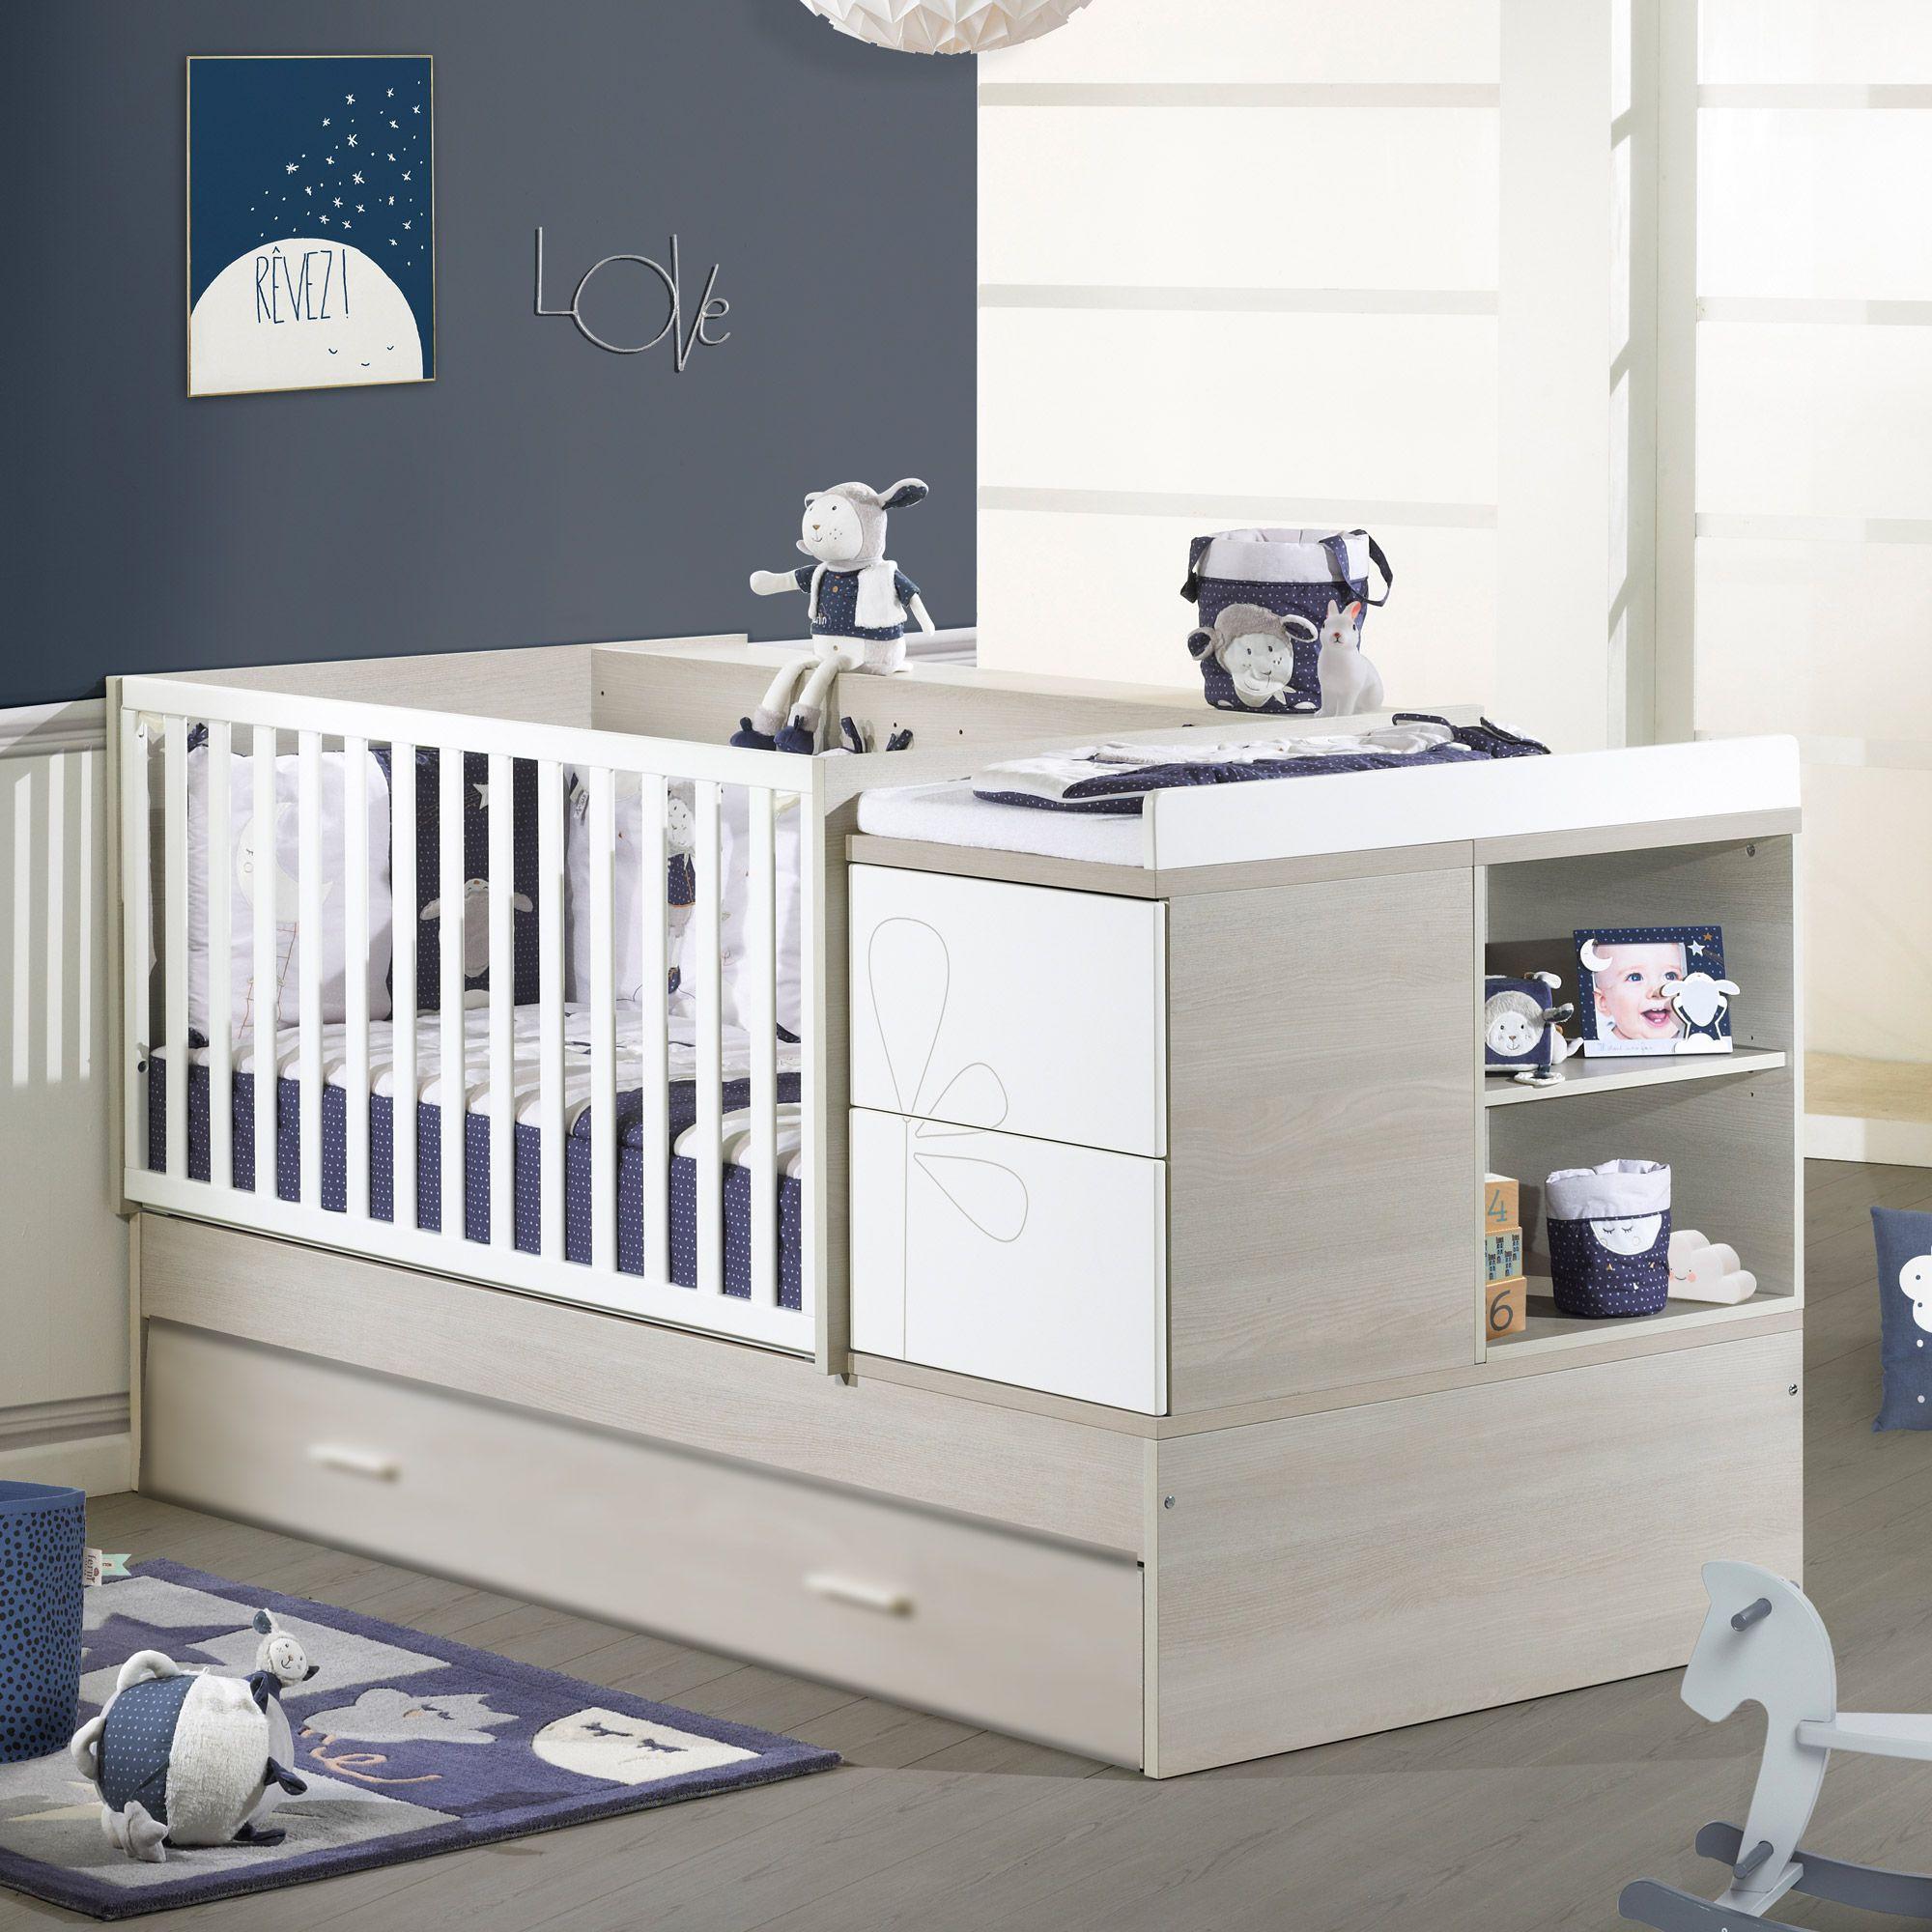 lit transformable 70x140 cm sauthon avis. Black Bedroom Furniture Sets. Home Design Ideas